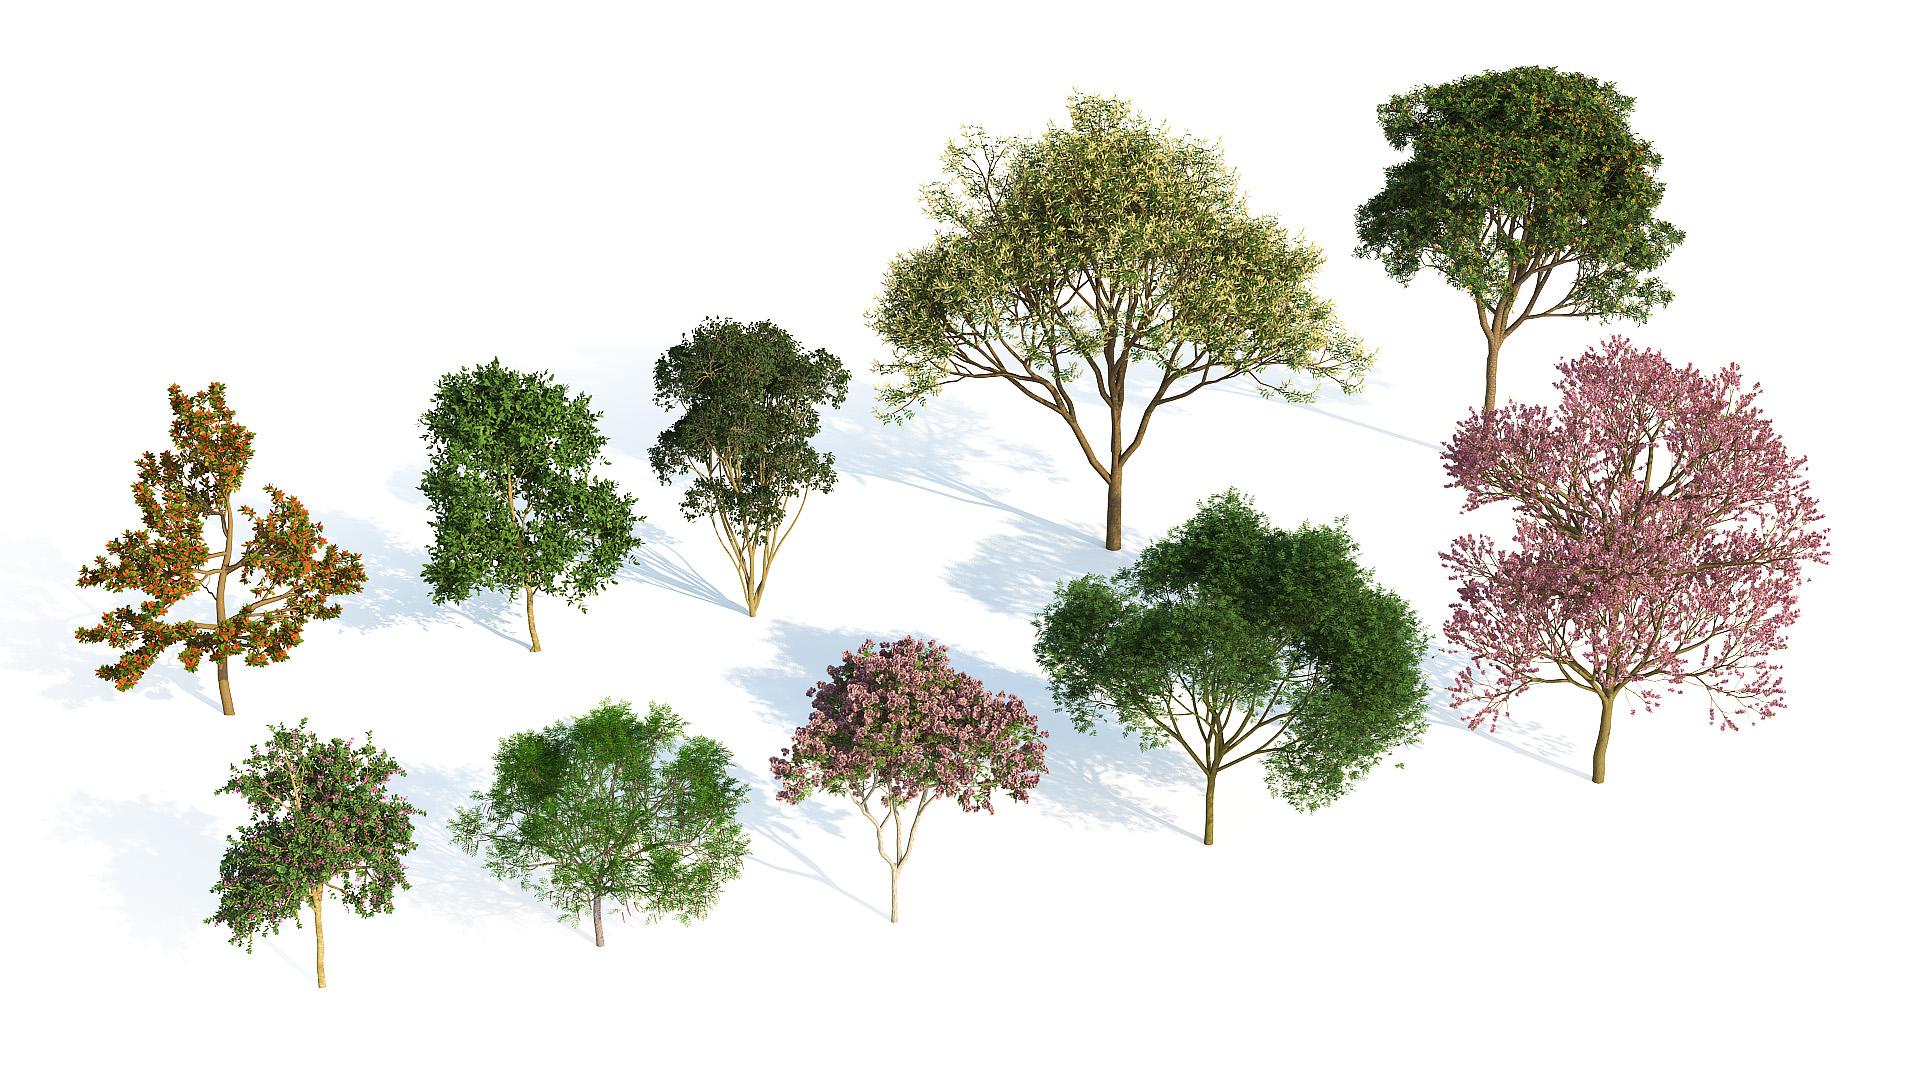 Laubwerk - Plants Kit 3 for 3ds Max, Maya, Cinema 4D